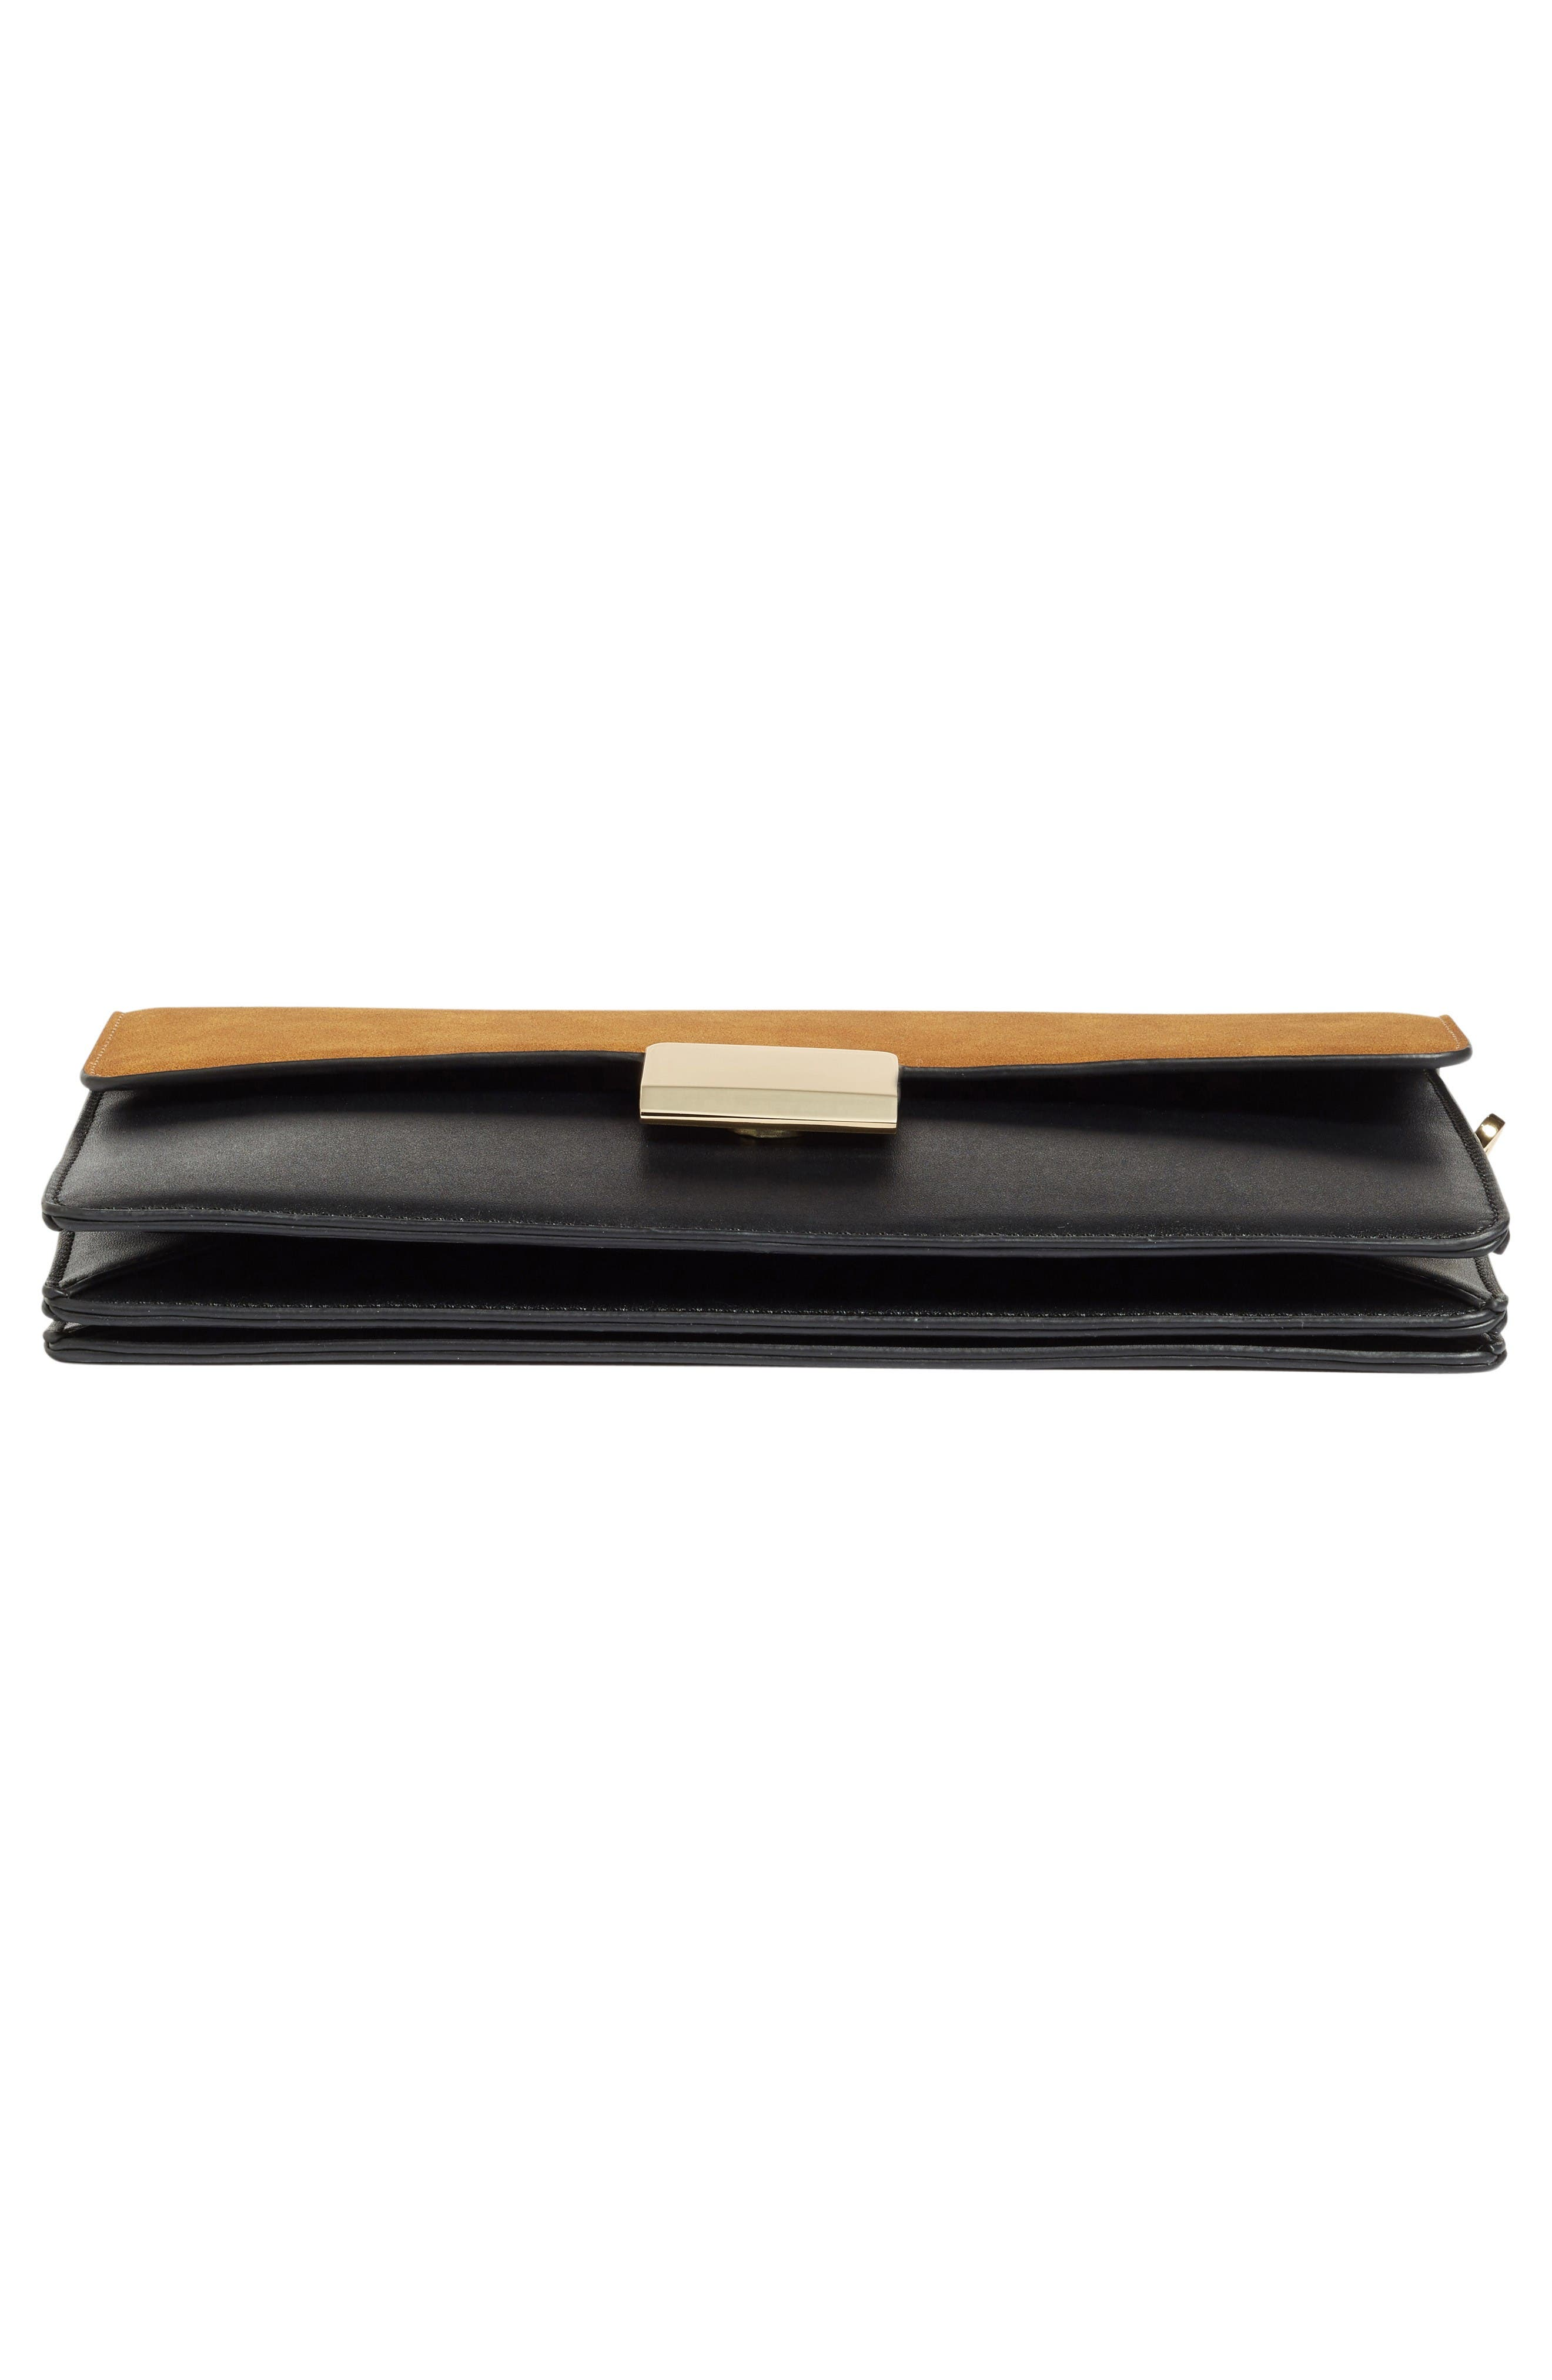 Leighton Colorblock Faux Leather Crossbody Bag,                             Alternate thumbnail 6, color,                             Black/Cognac